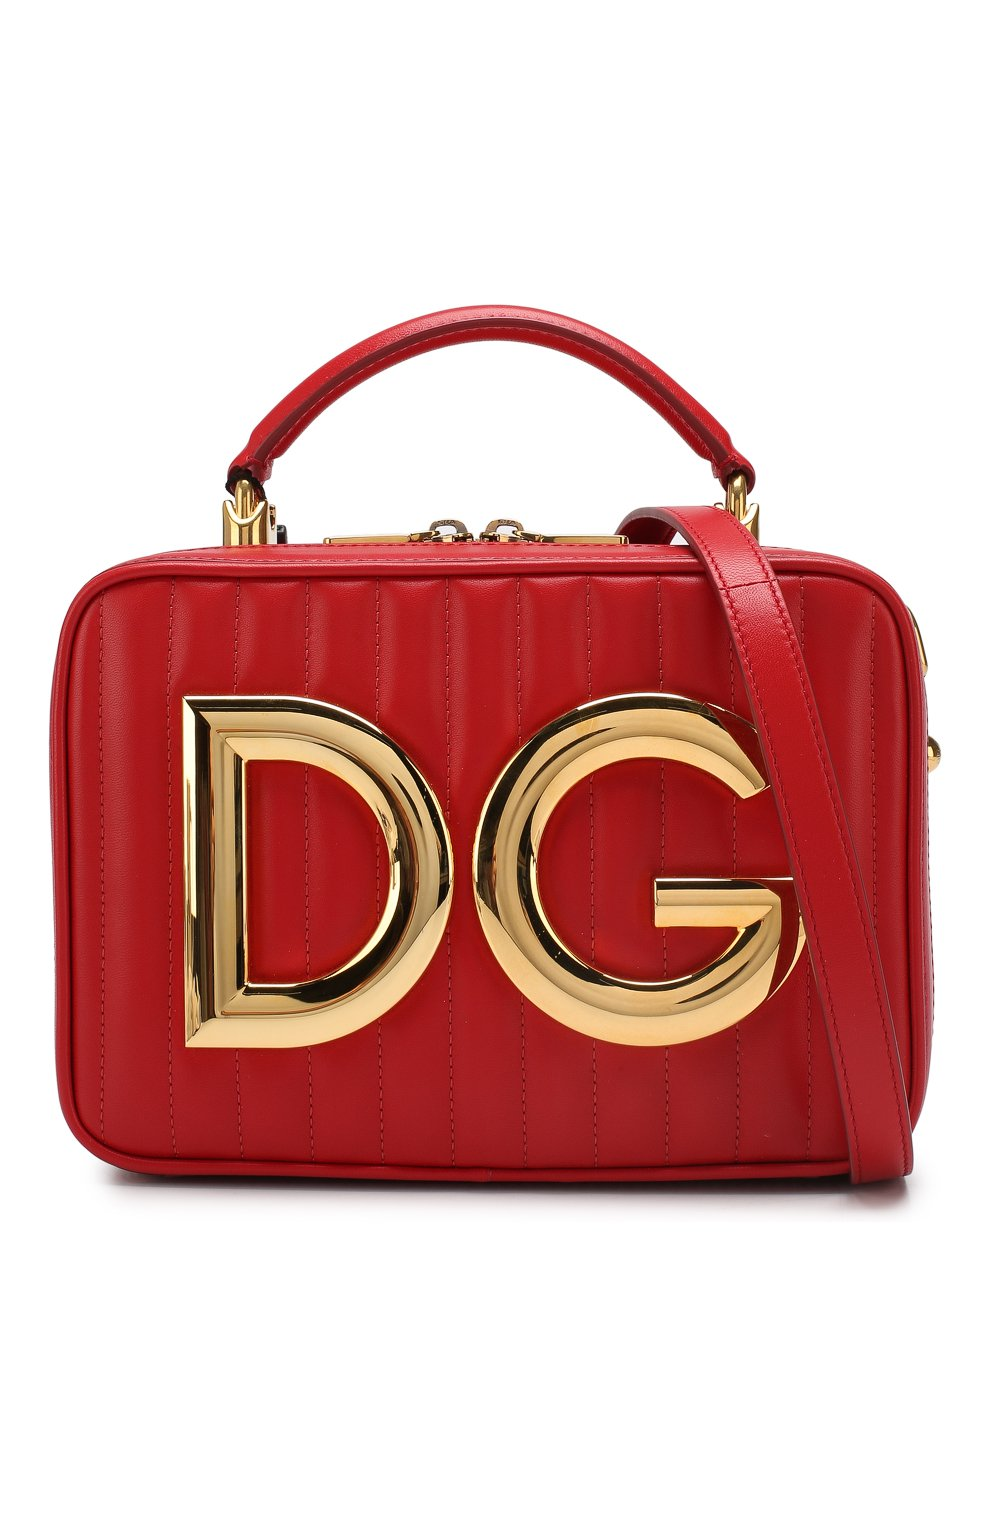 Сумка DG Girls Dolce & Gabbana красная цвета | Фото №6